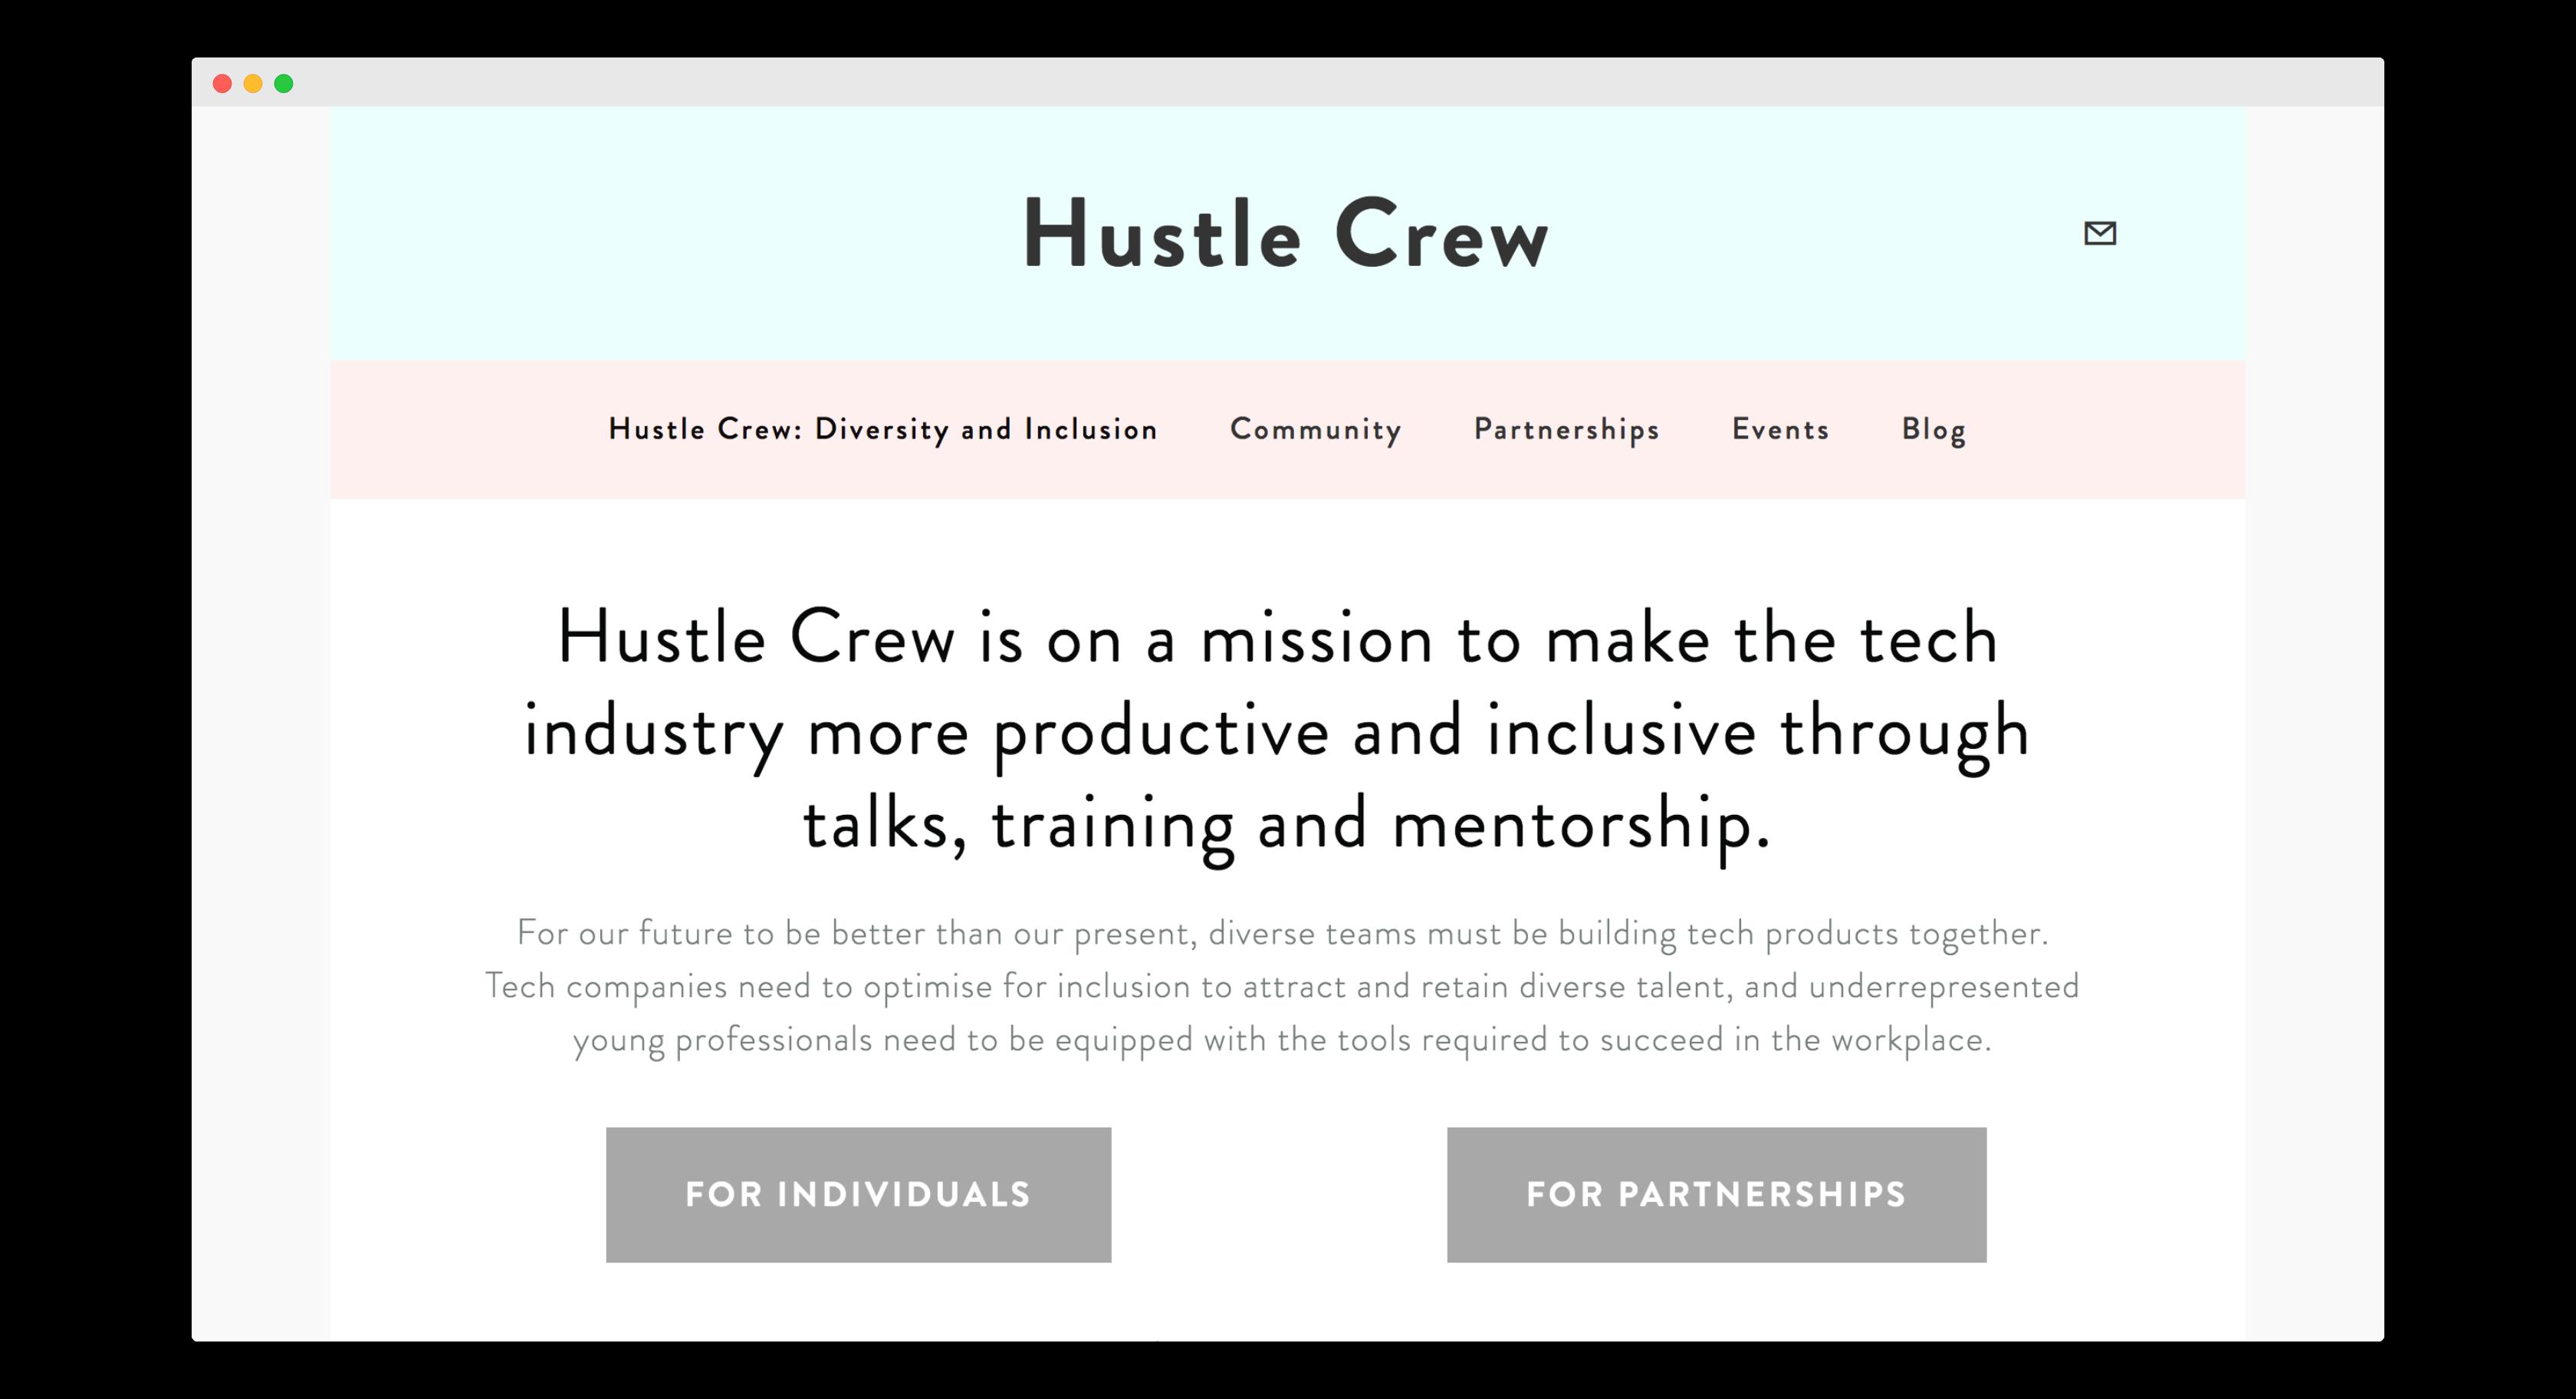 Hustle Crew's homepage